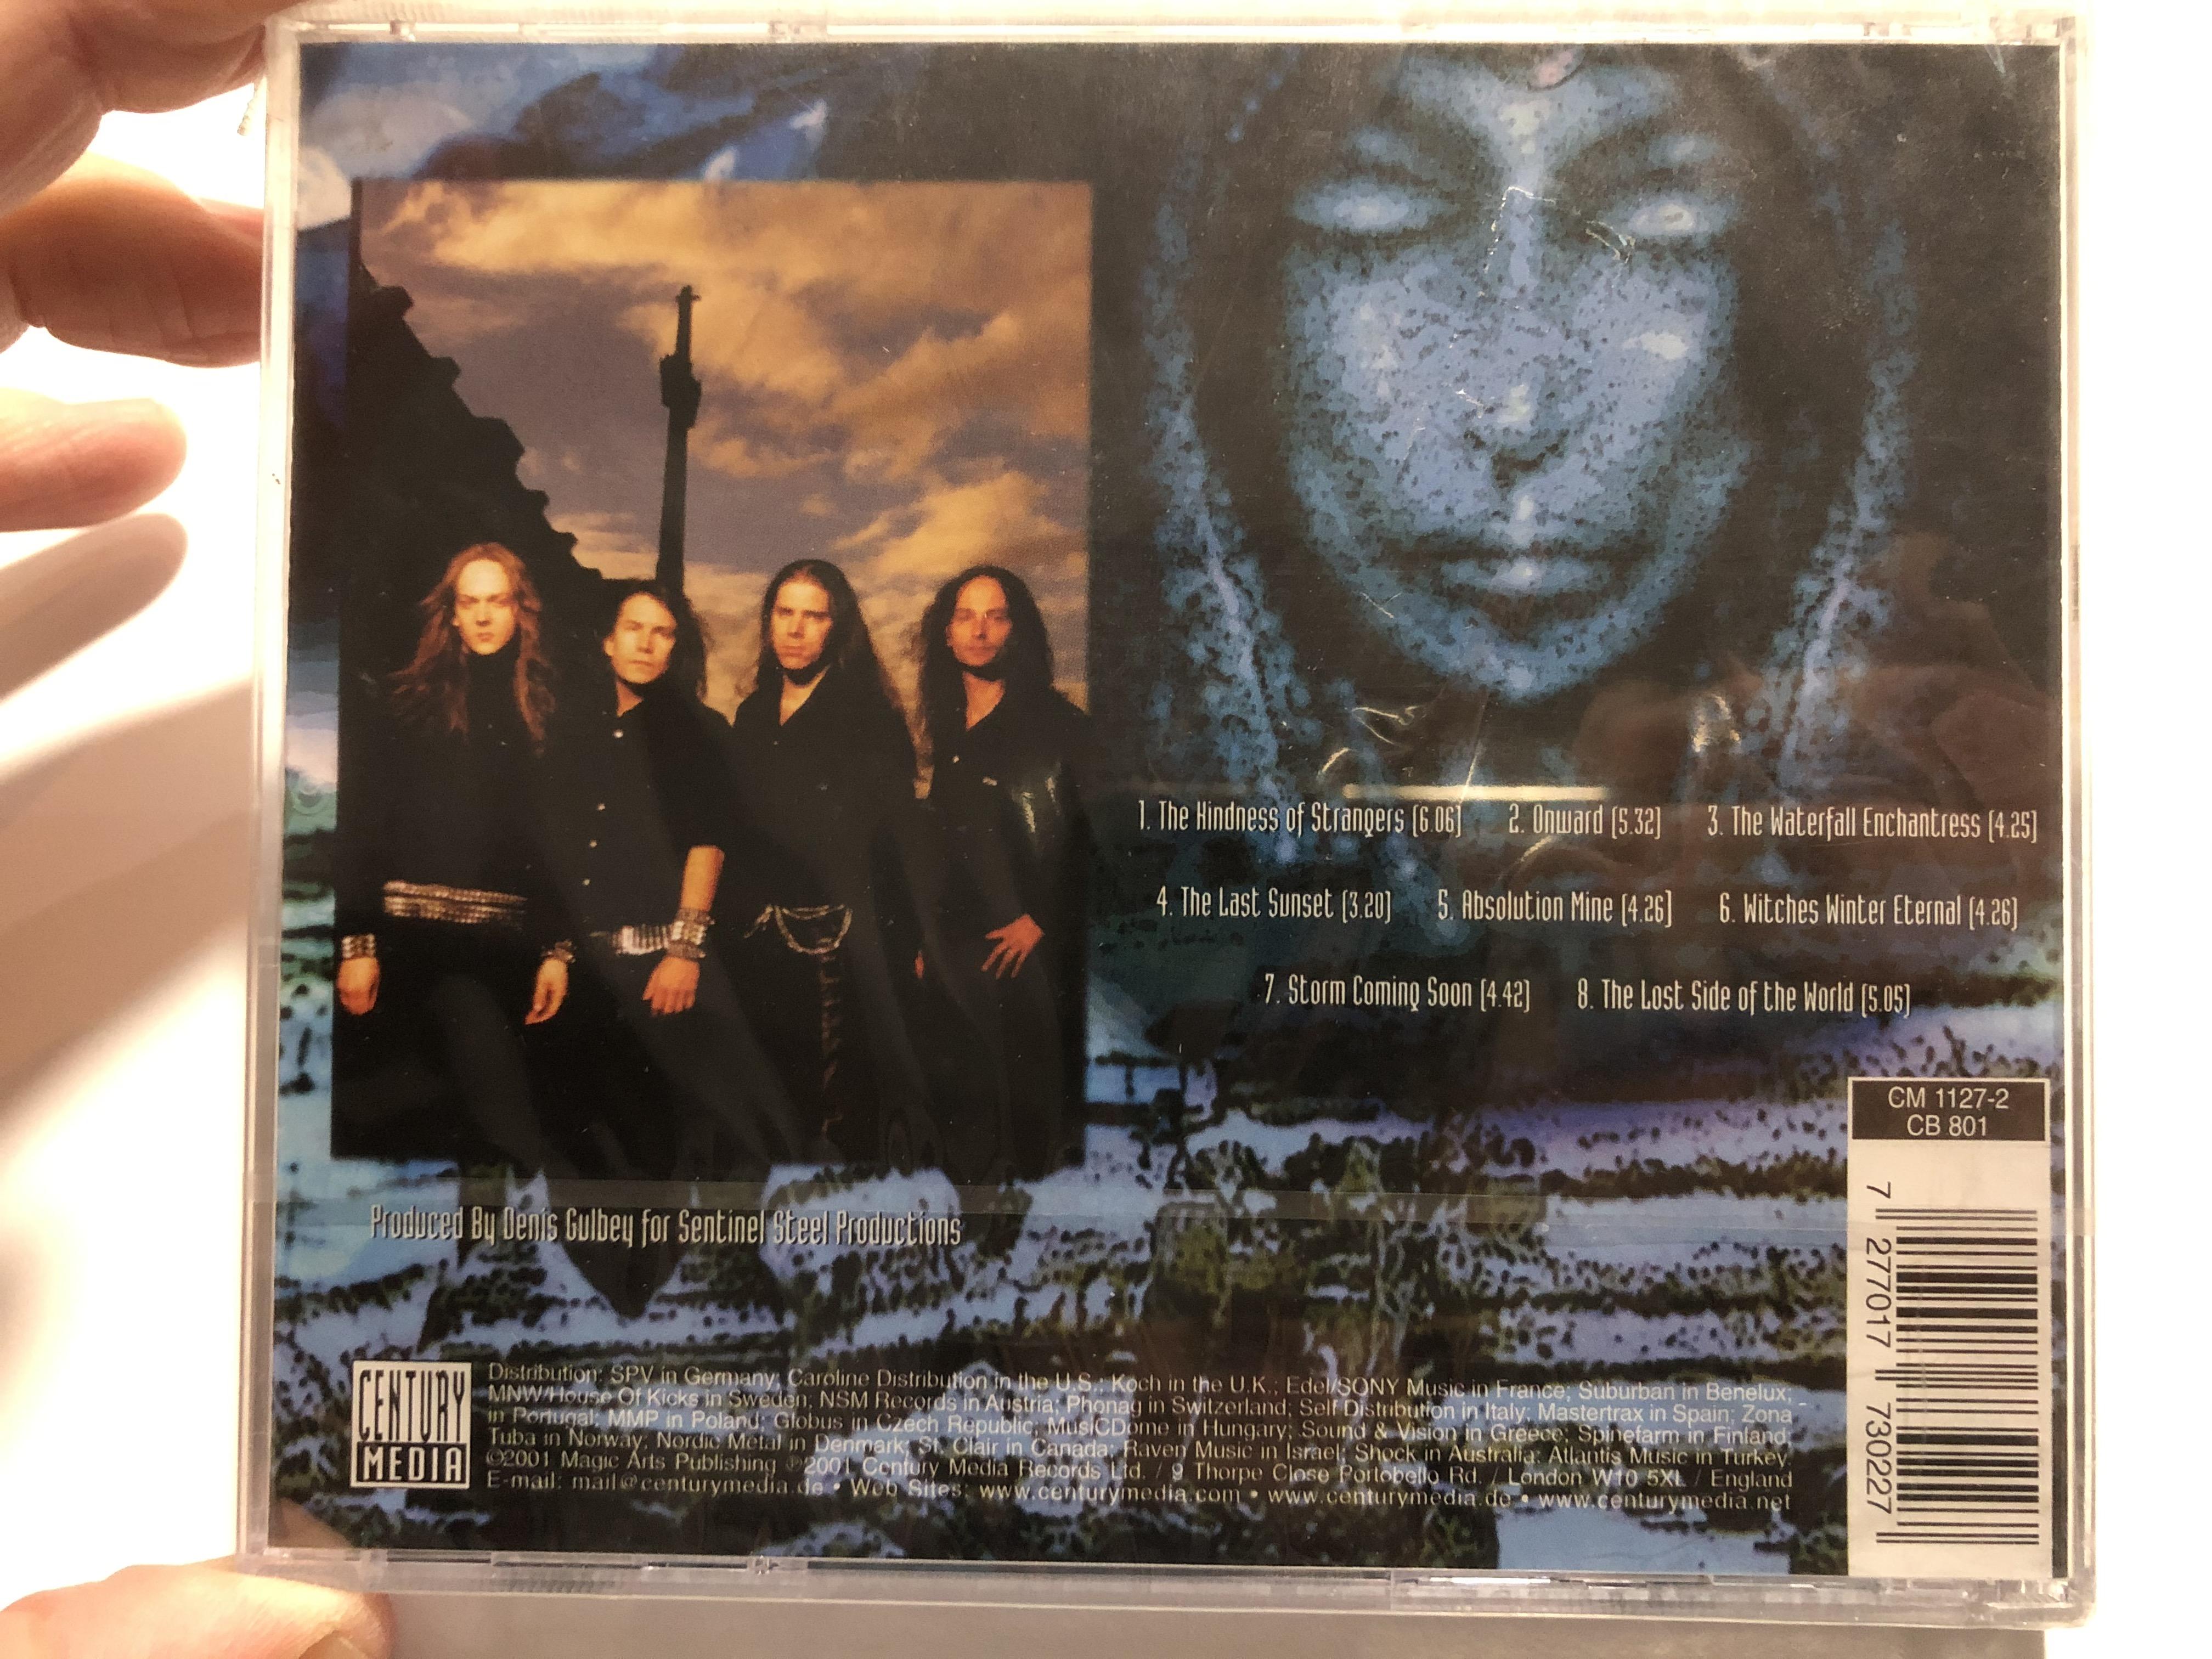 onward-evermoving-century-media-audio-cd-2001-77302-2-2-.jpg